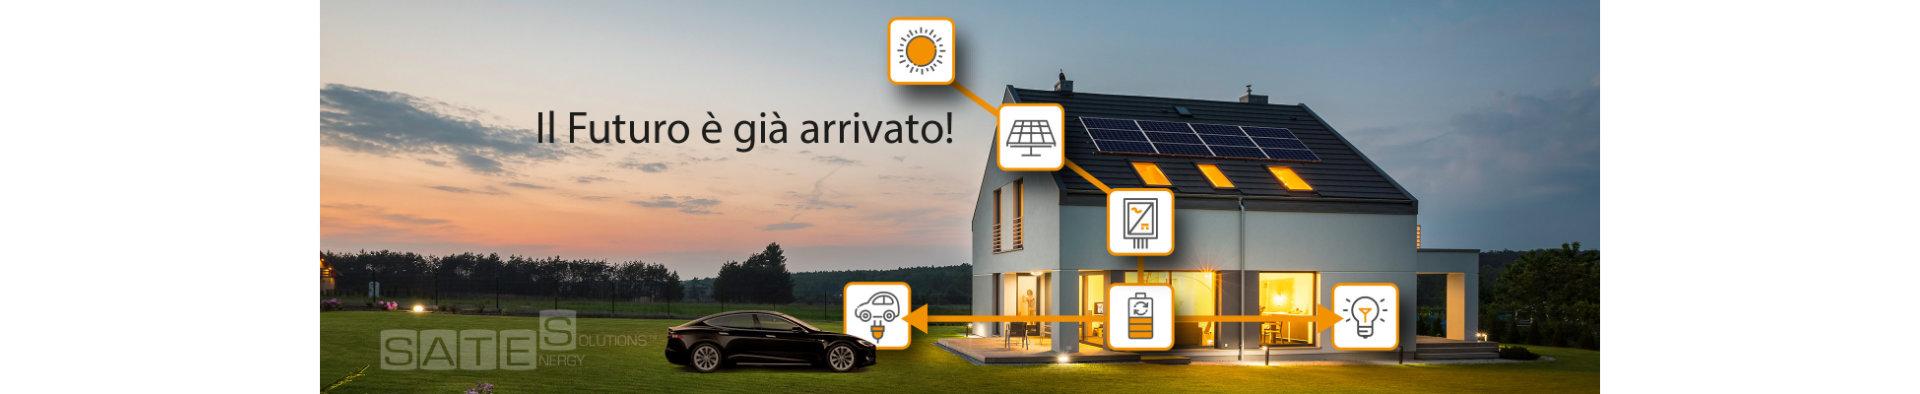 slide-fotovoltaico